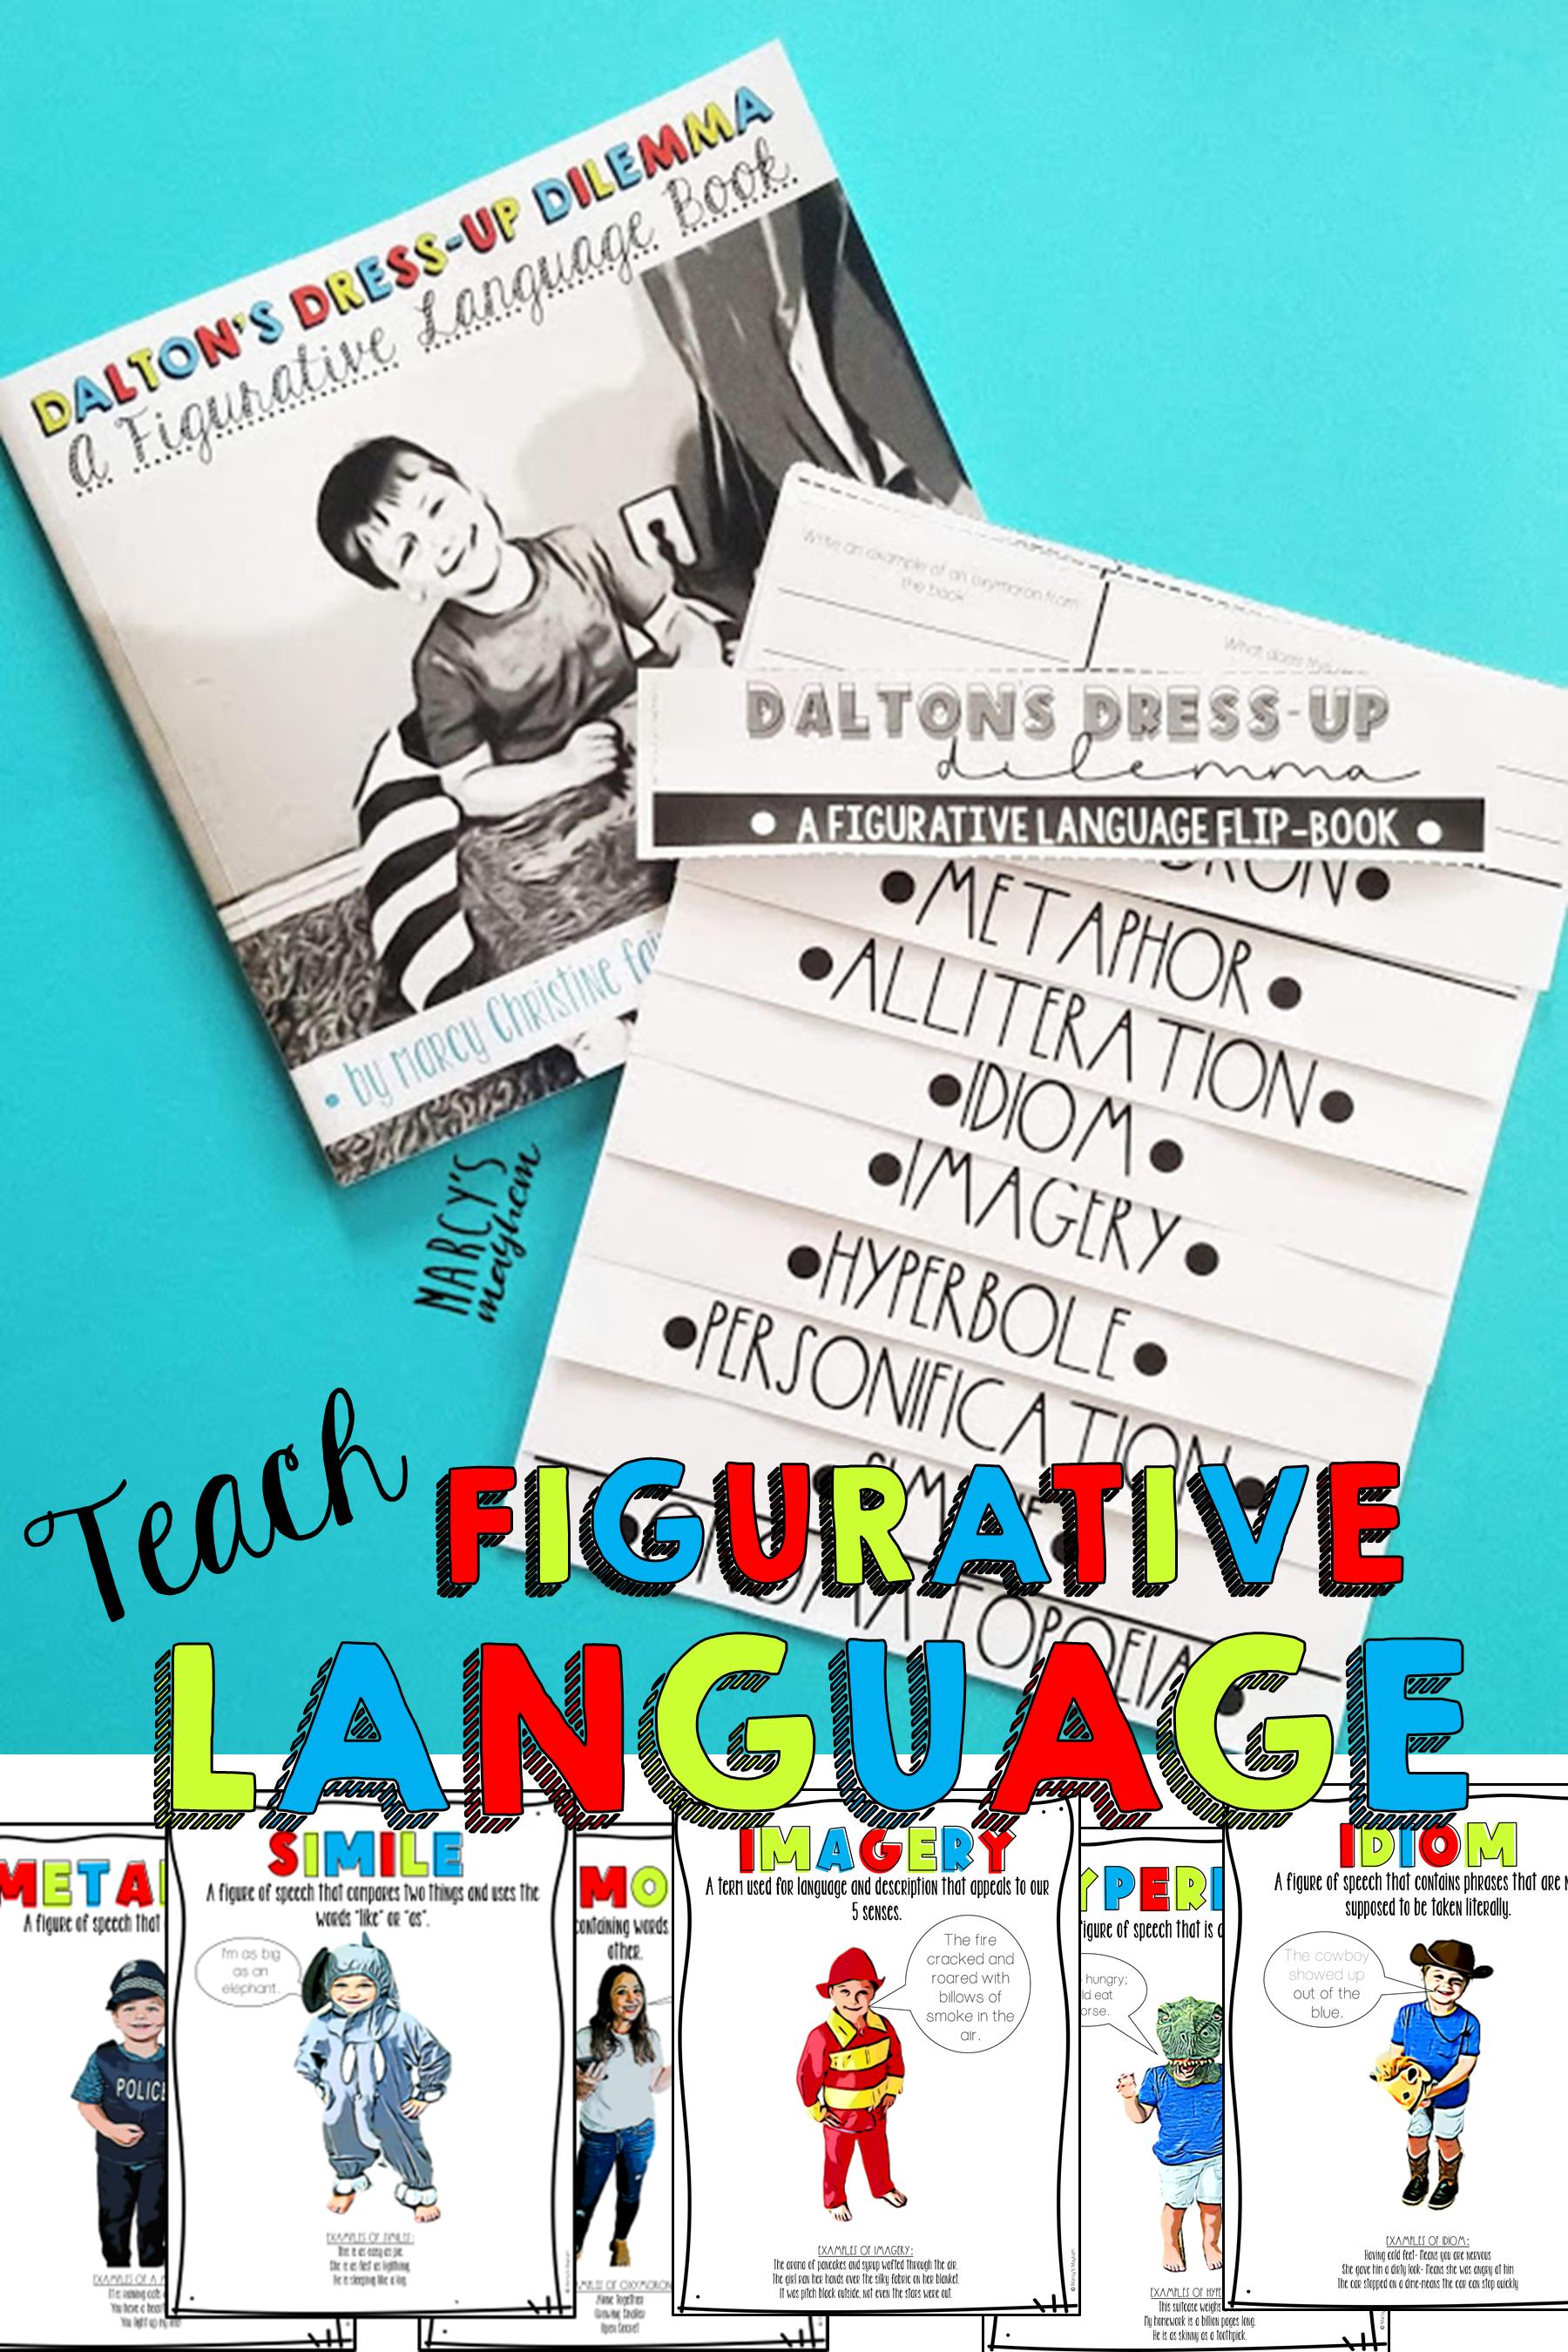 Teaching Figurative Language Onomatopoeia Idioms